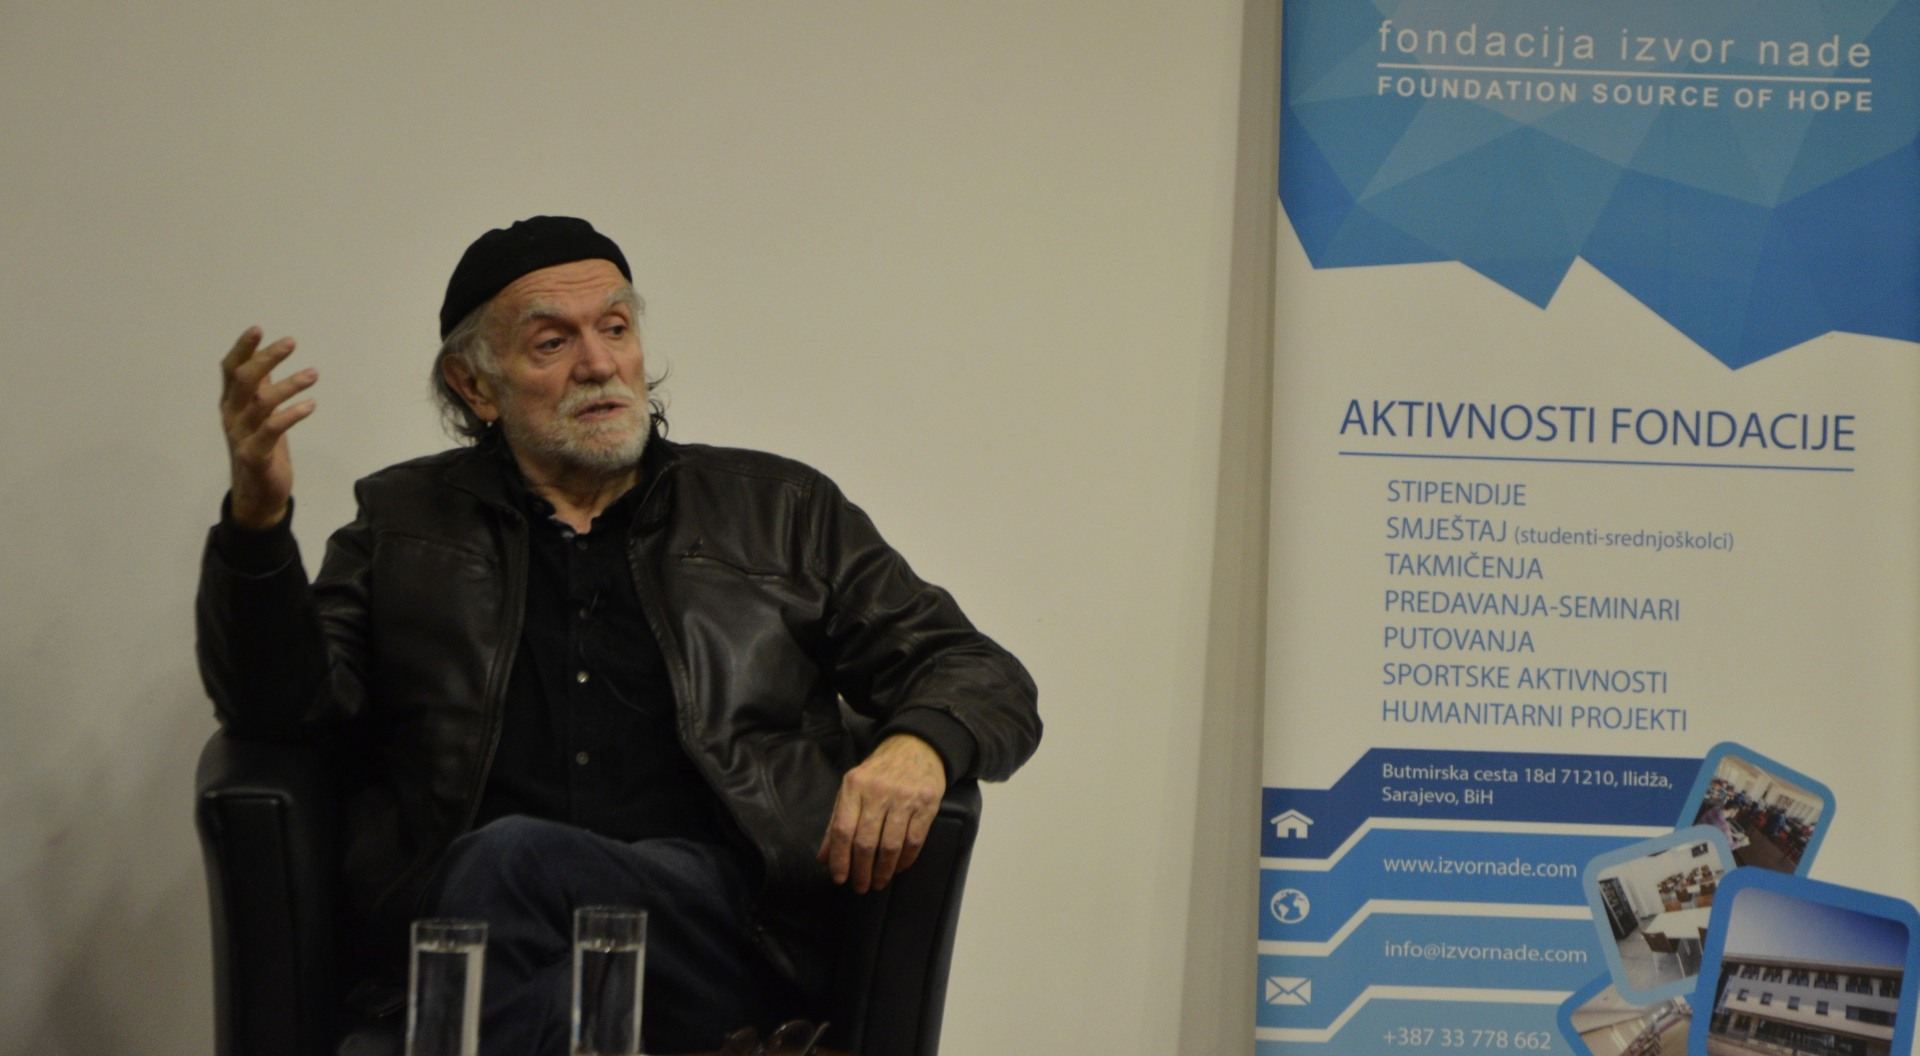 Josip Pejakovic_Fondacija Izvor nade 1